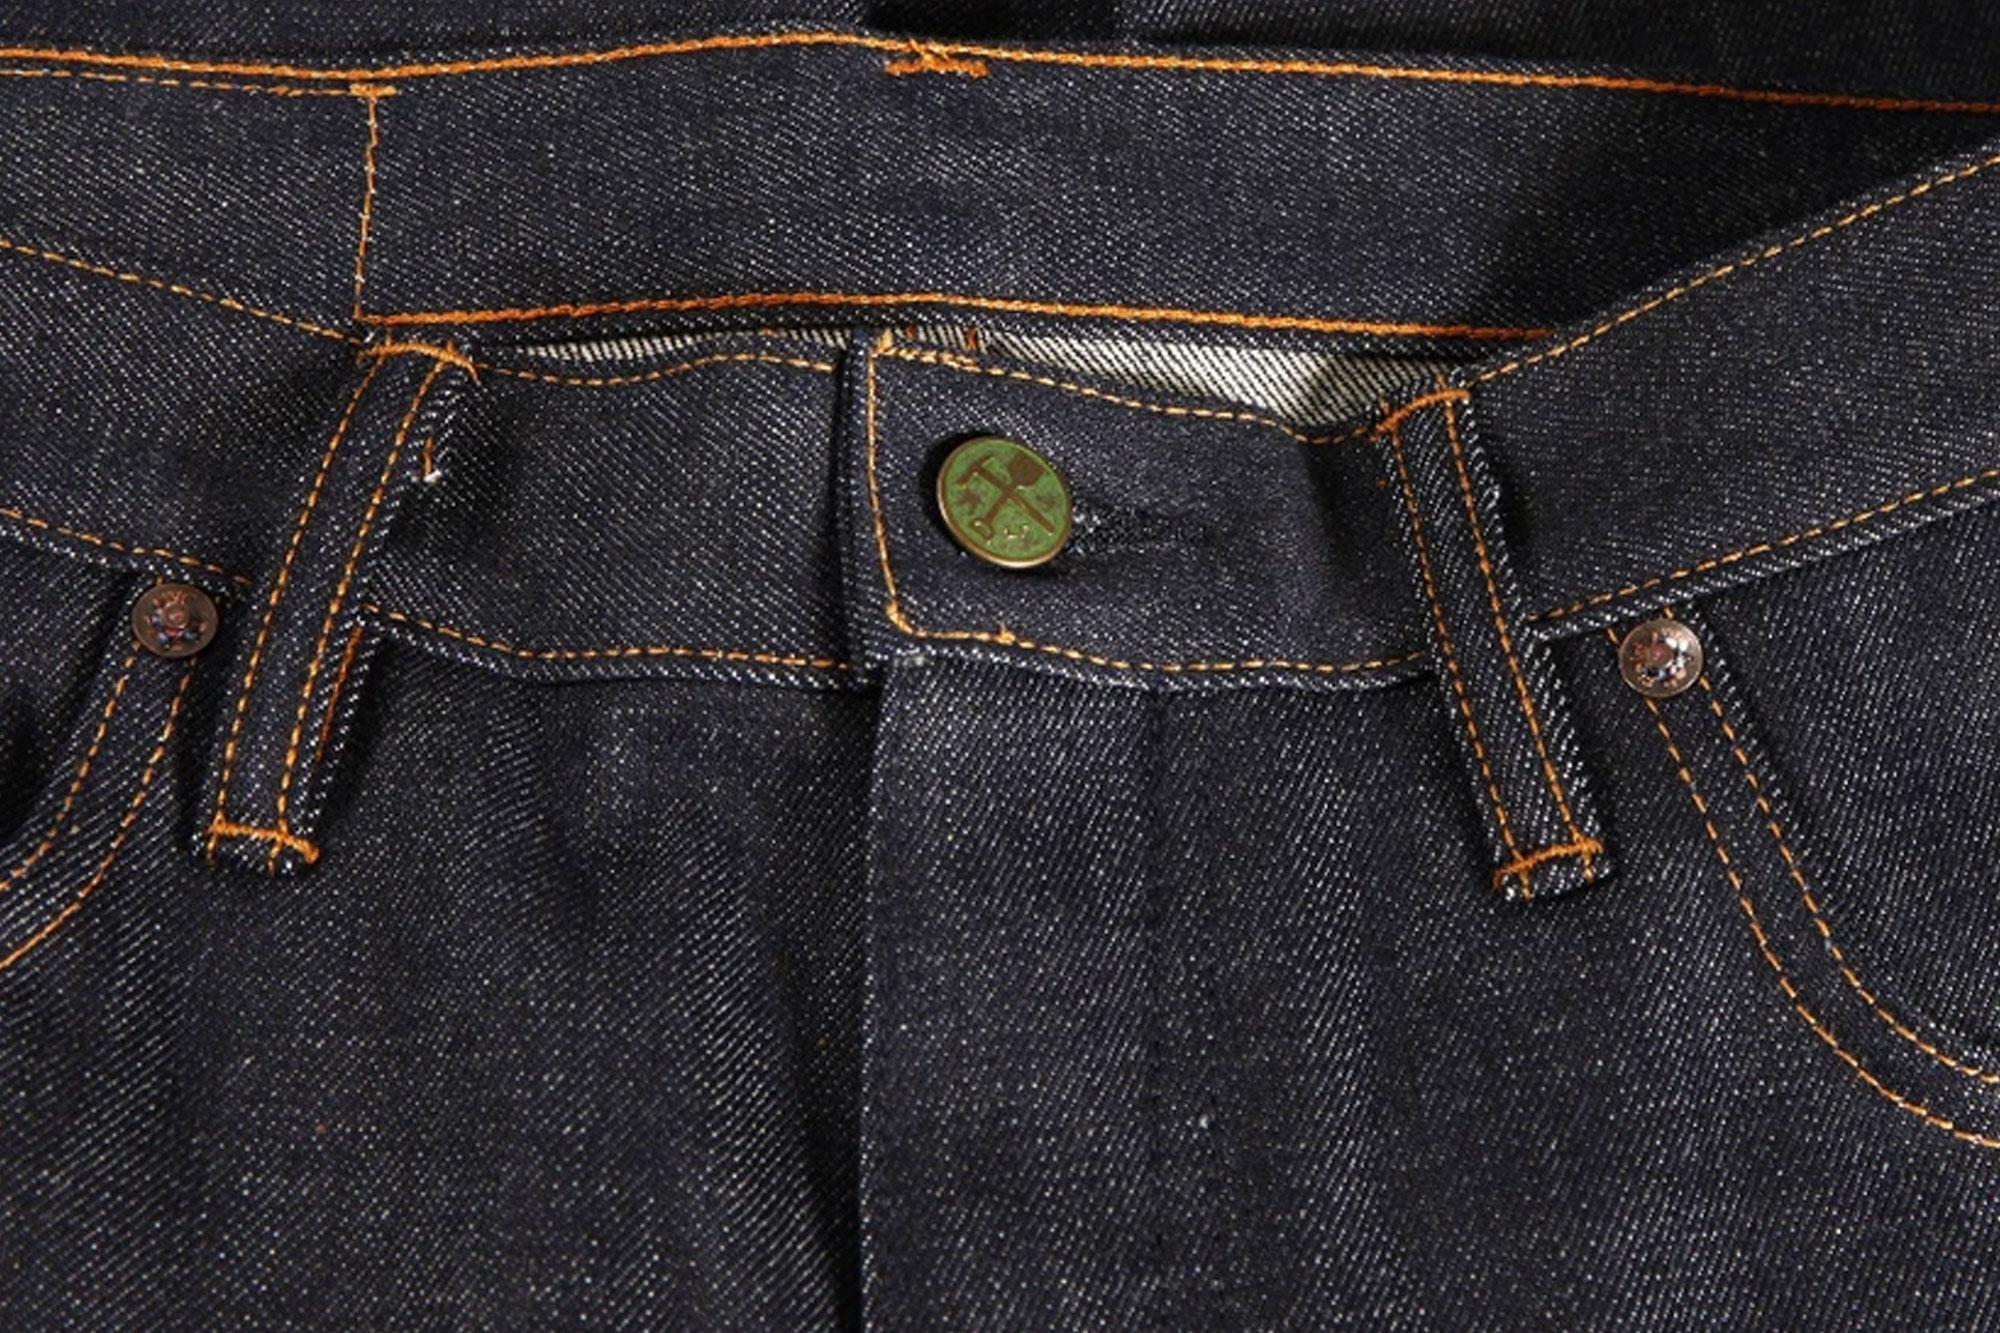 Pre-Order Left Field's Vidalia Mills Jeans Made on the White Oak Looms